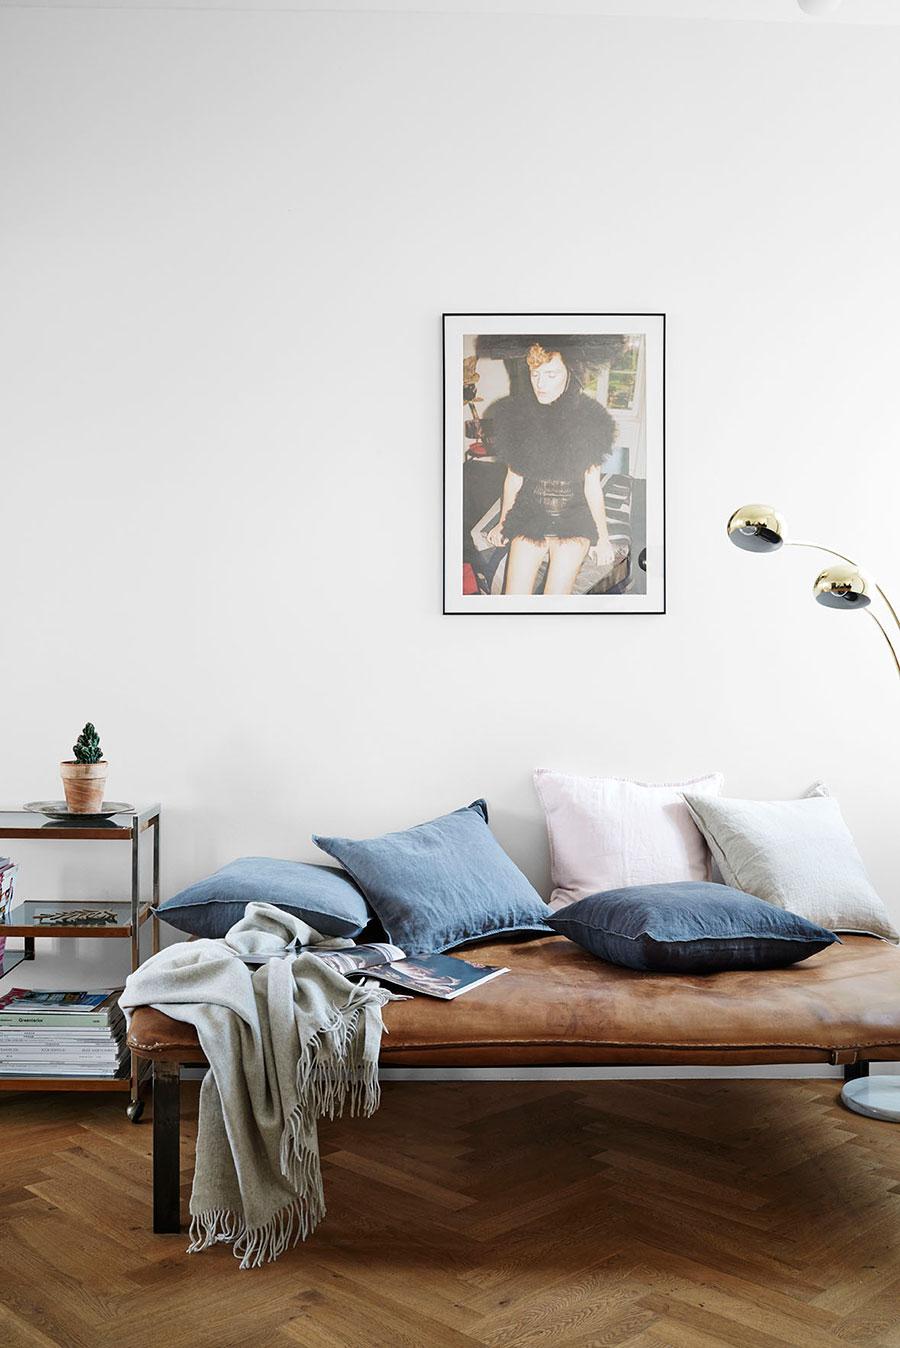 ROSE & IVY Journal Inspiring Interiors Cozy and Minimal in Denmark